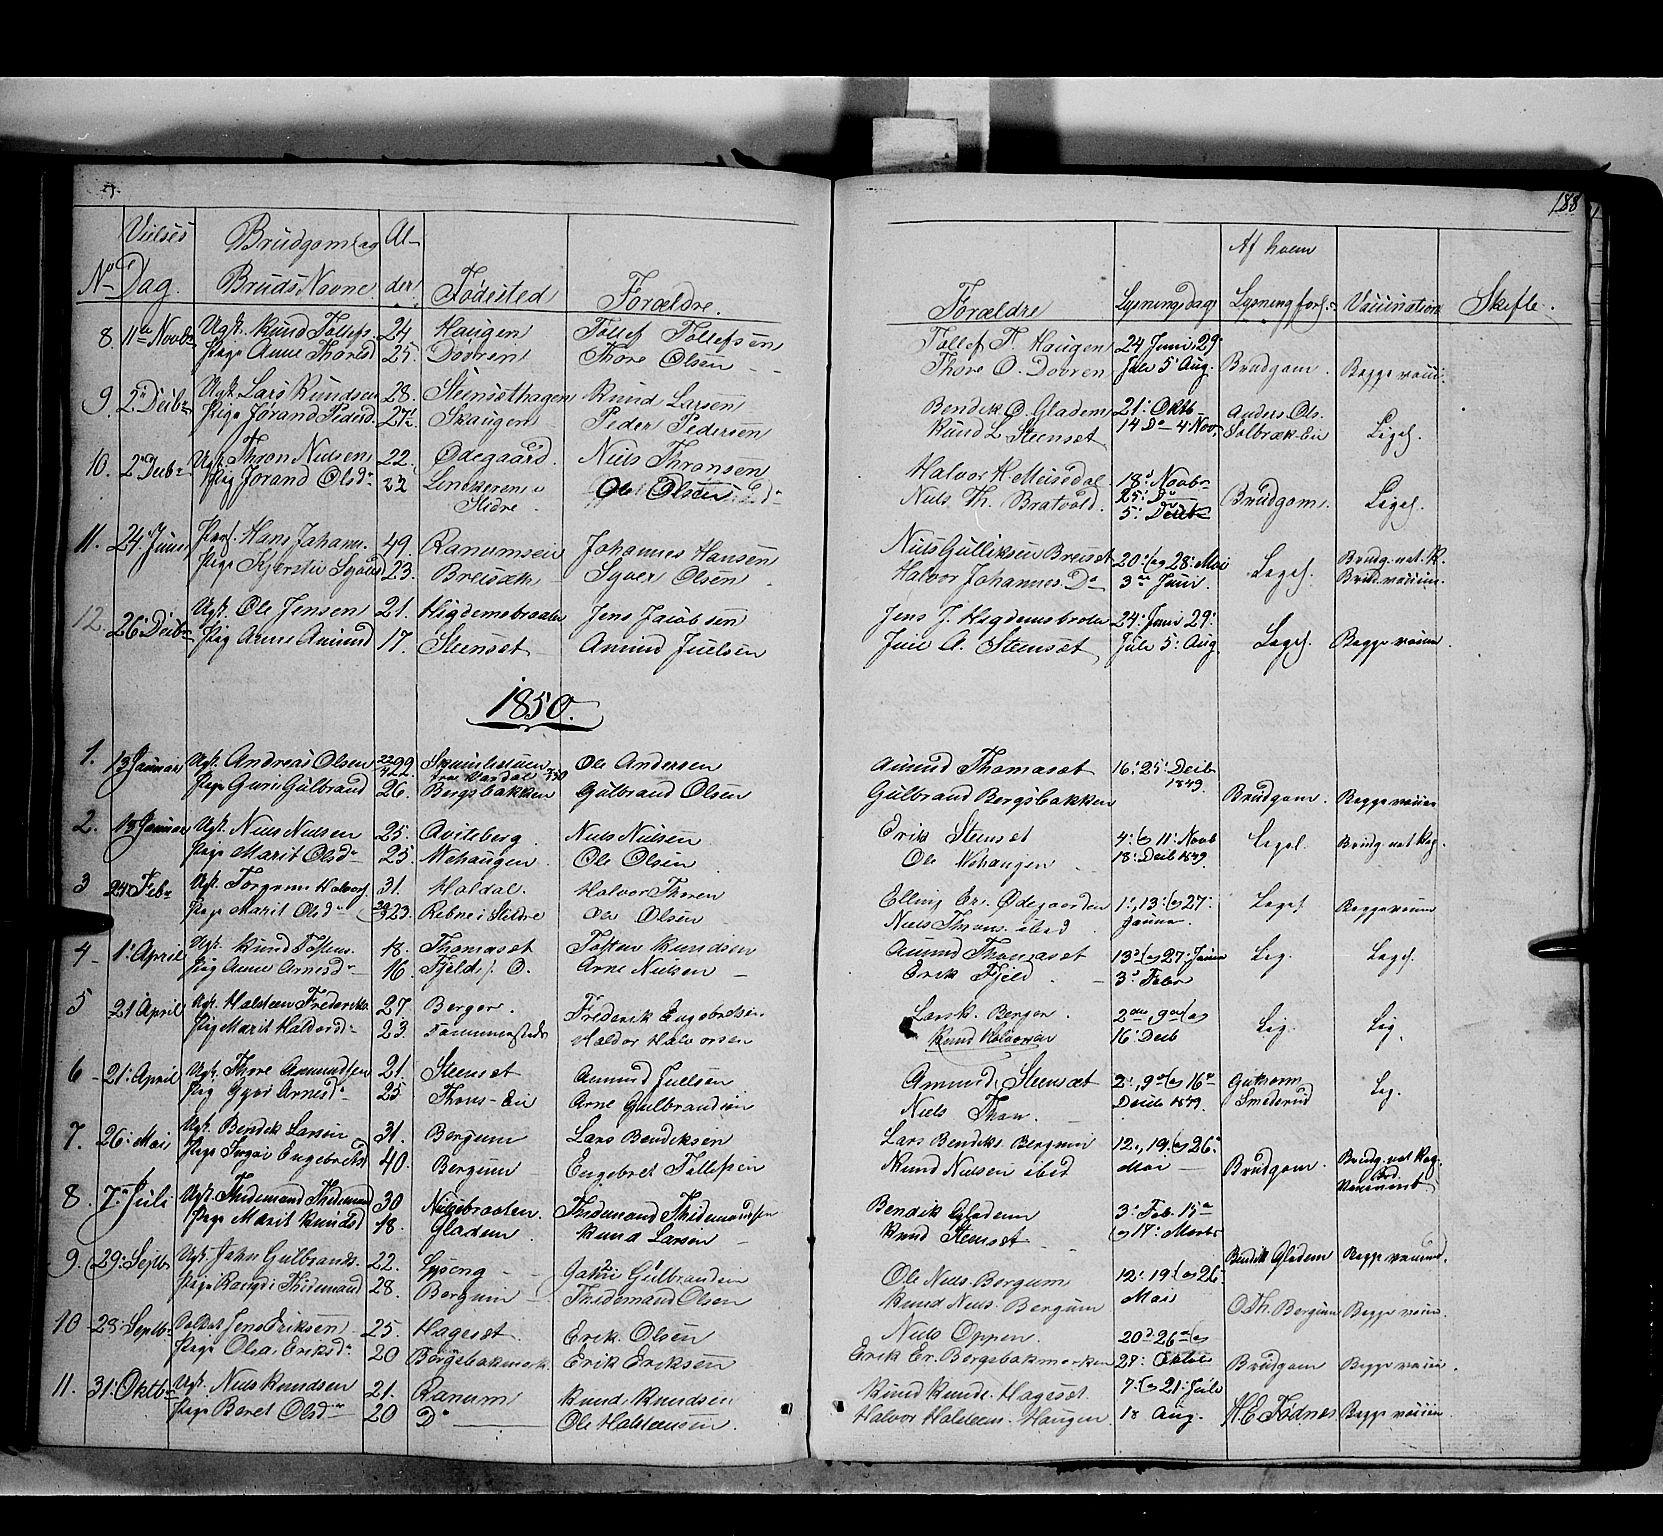 SAH, Nord-Aurdal prestekontor, Ministerialbok nr. 7, 1842-1863, s. 188